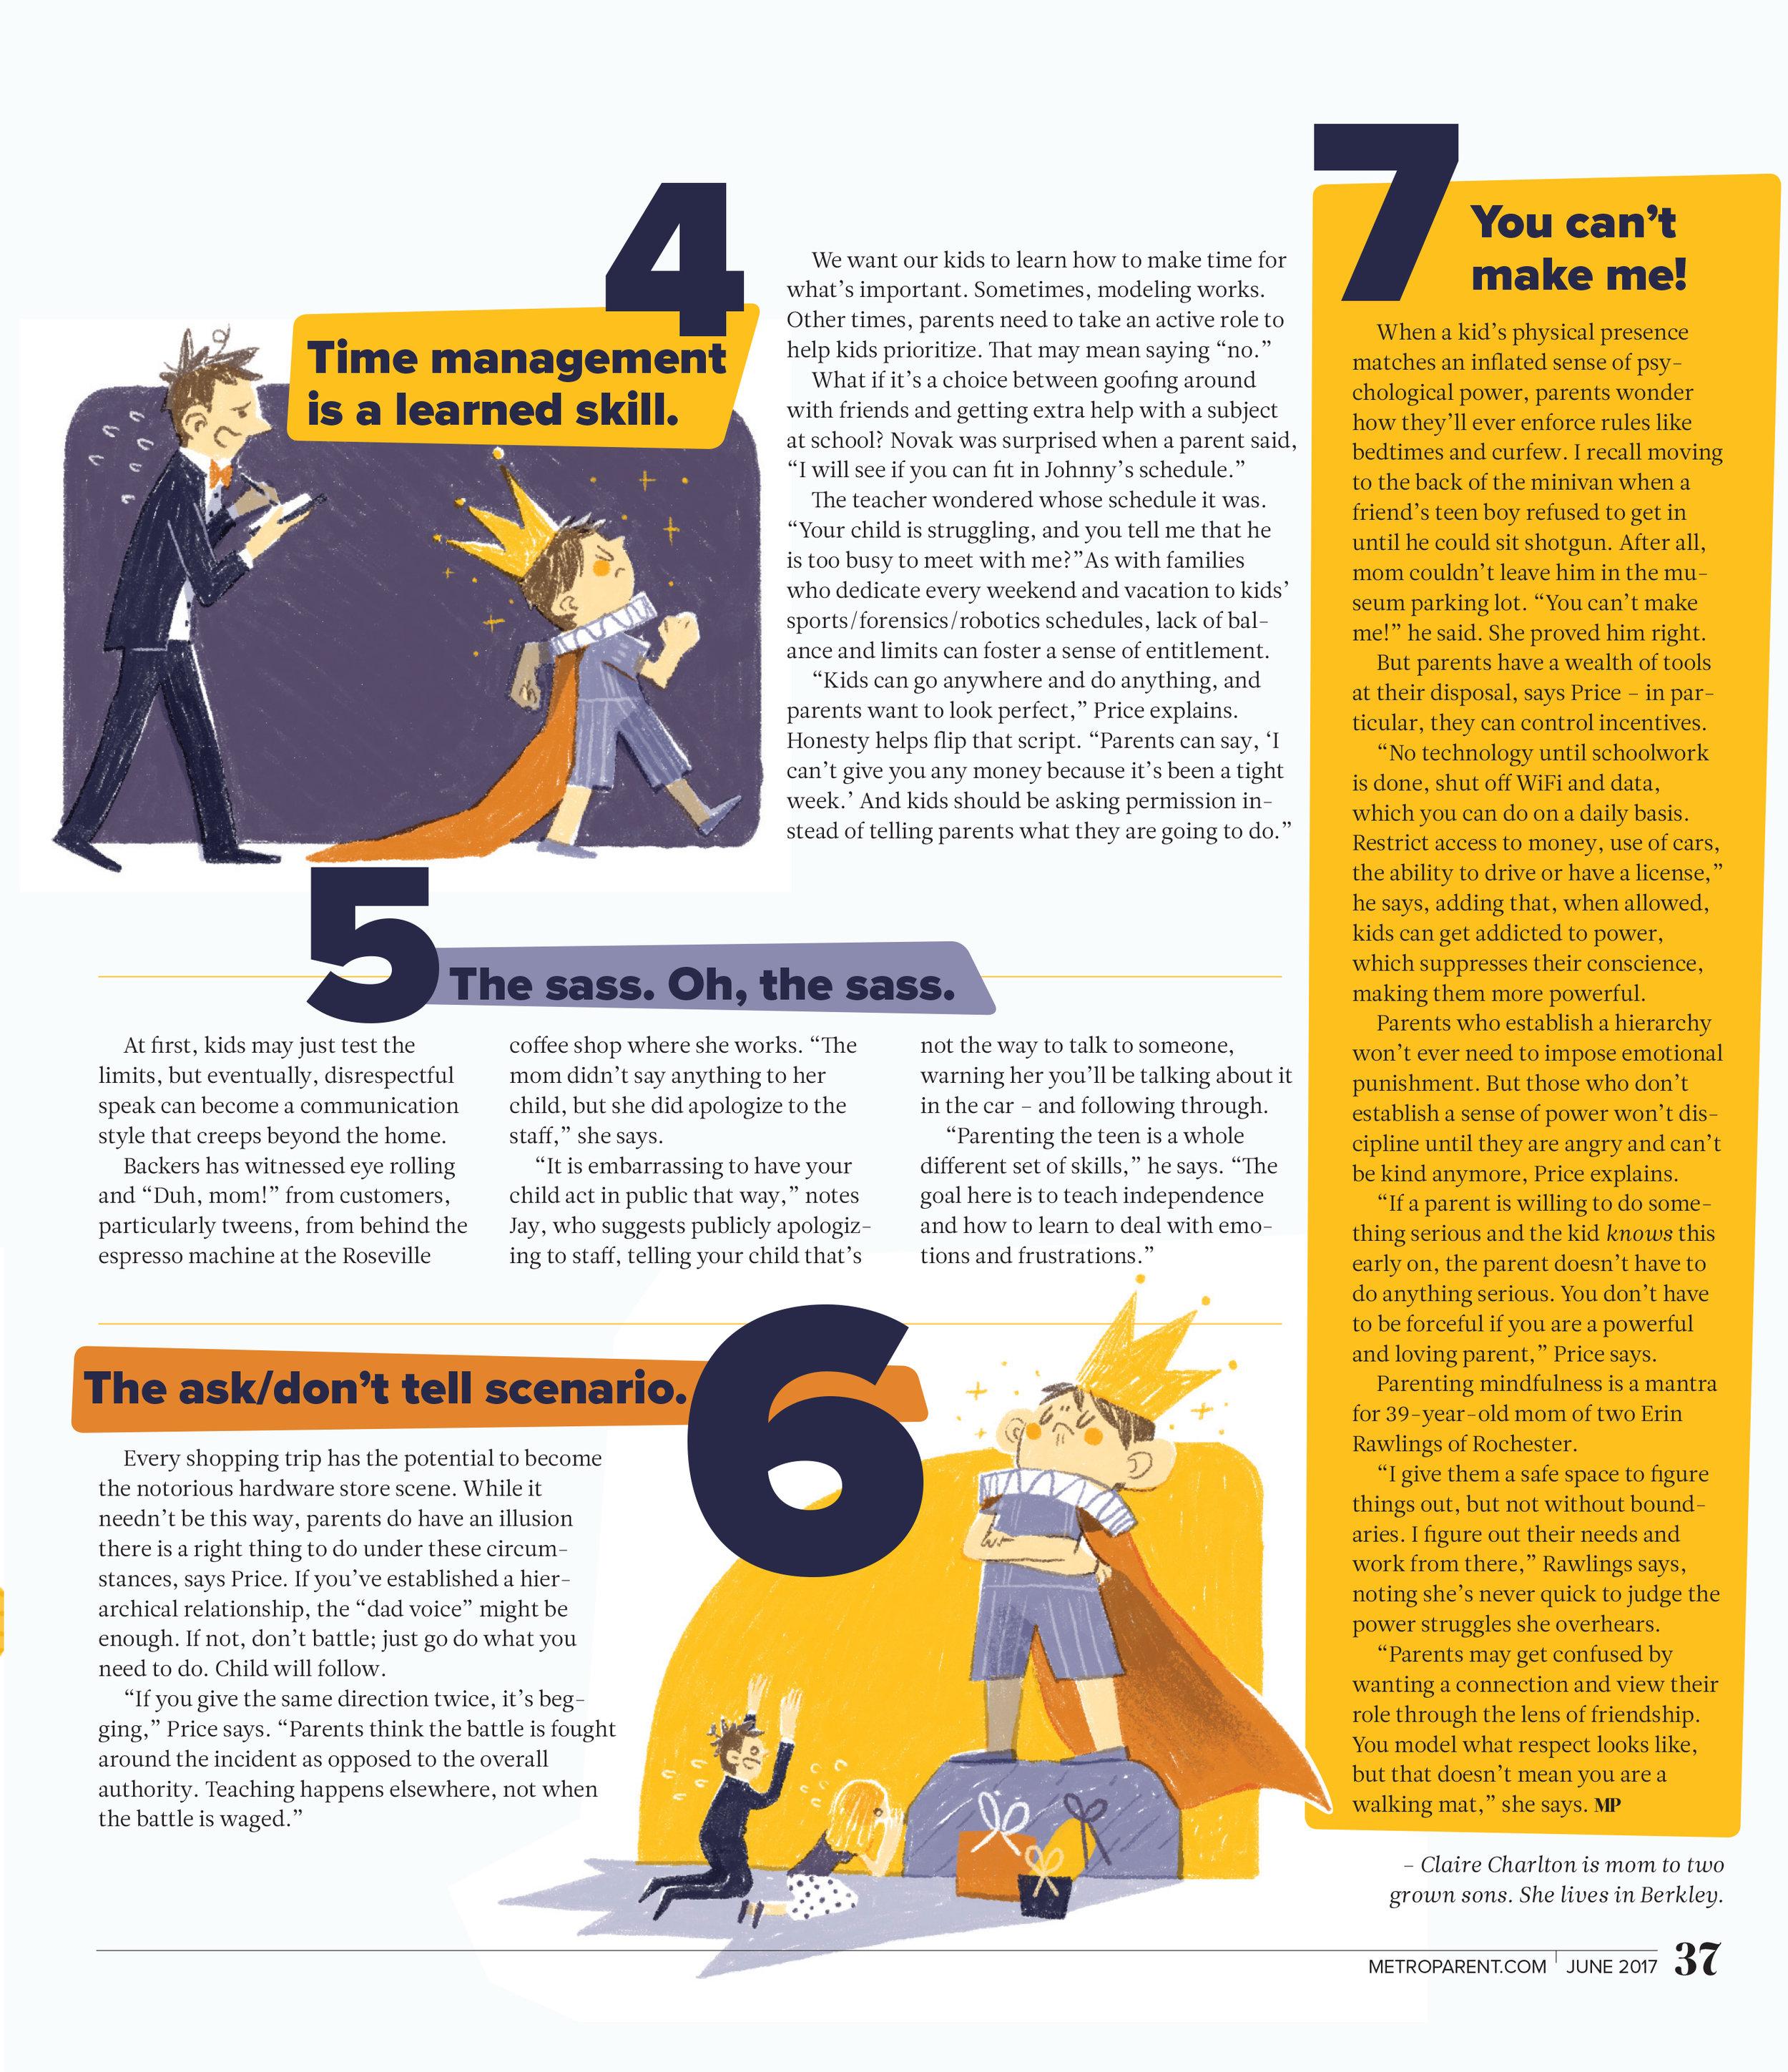 Metro parent Jun 2017/ AD:Kelly Buren http://www.metroparent.com/metro-parent-magazine/m-parenting/m-child-behavior-discipline/taking-back-power-alpha-kid/